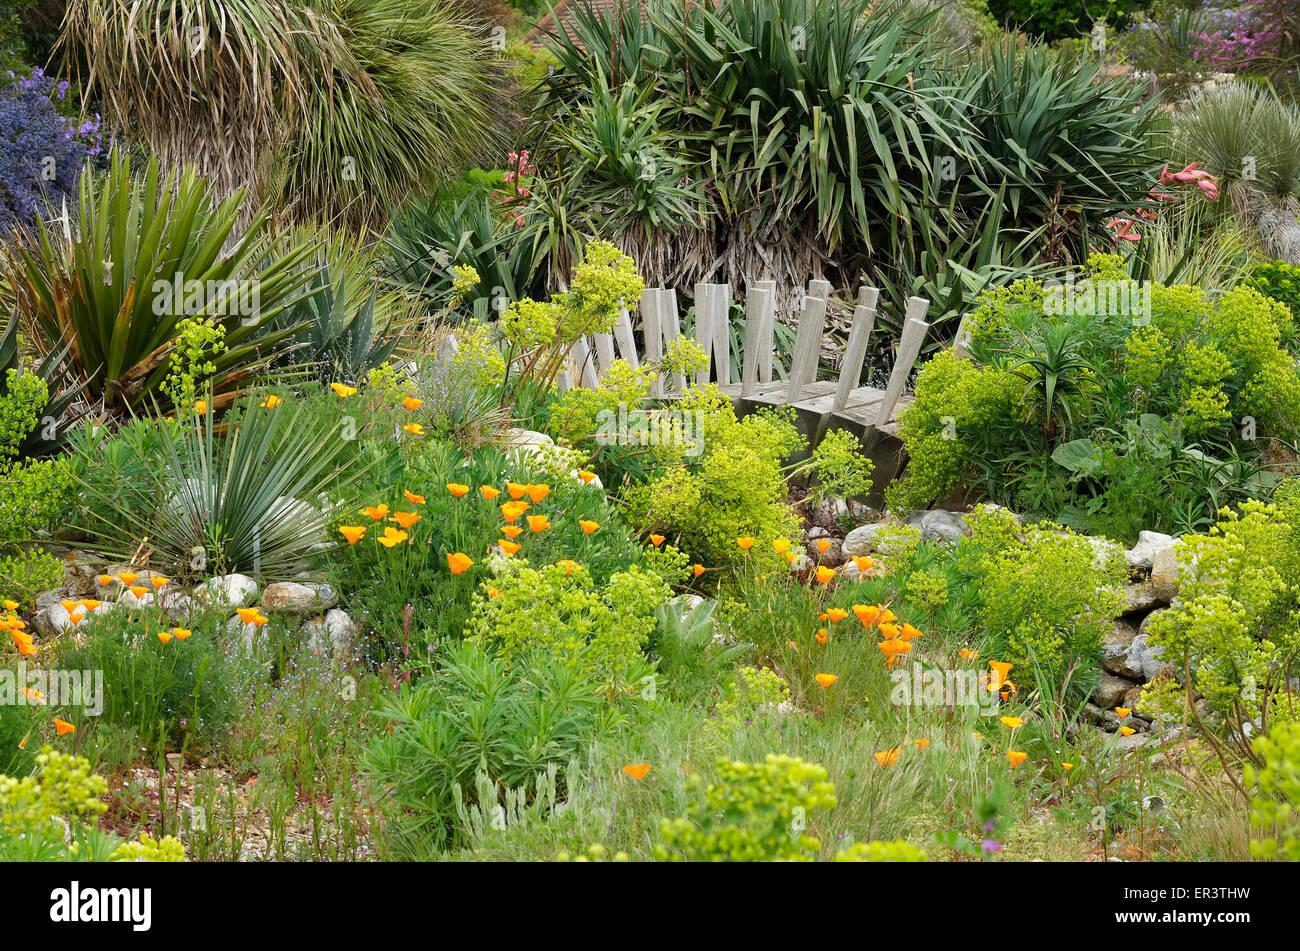 exotic plants in desert style garden, east ruston, norfolk, england - Stock Image